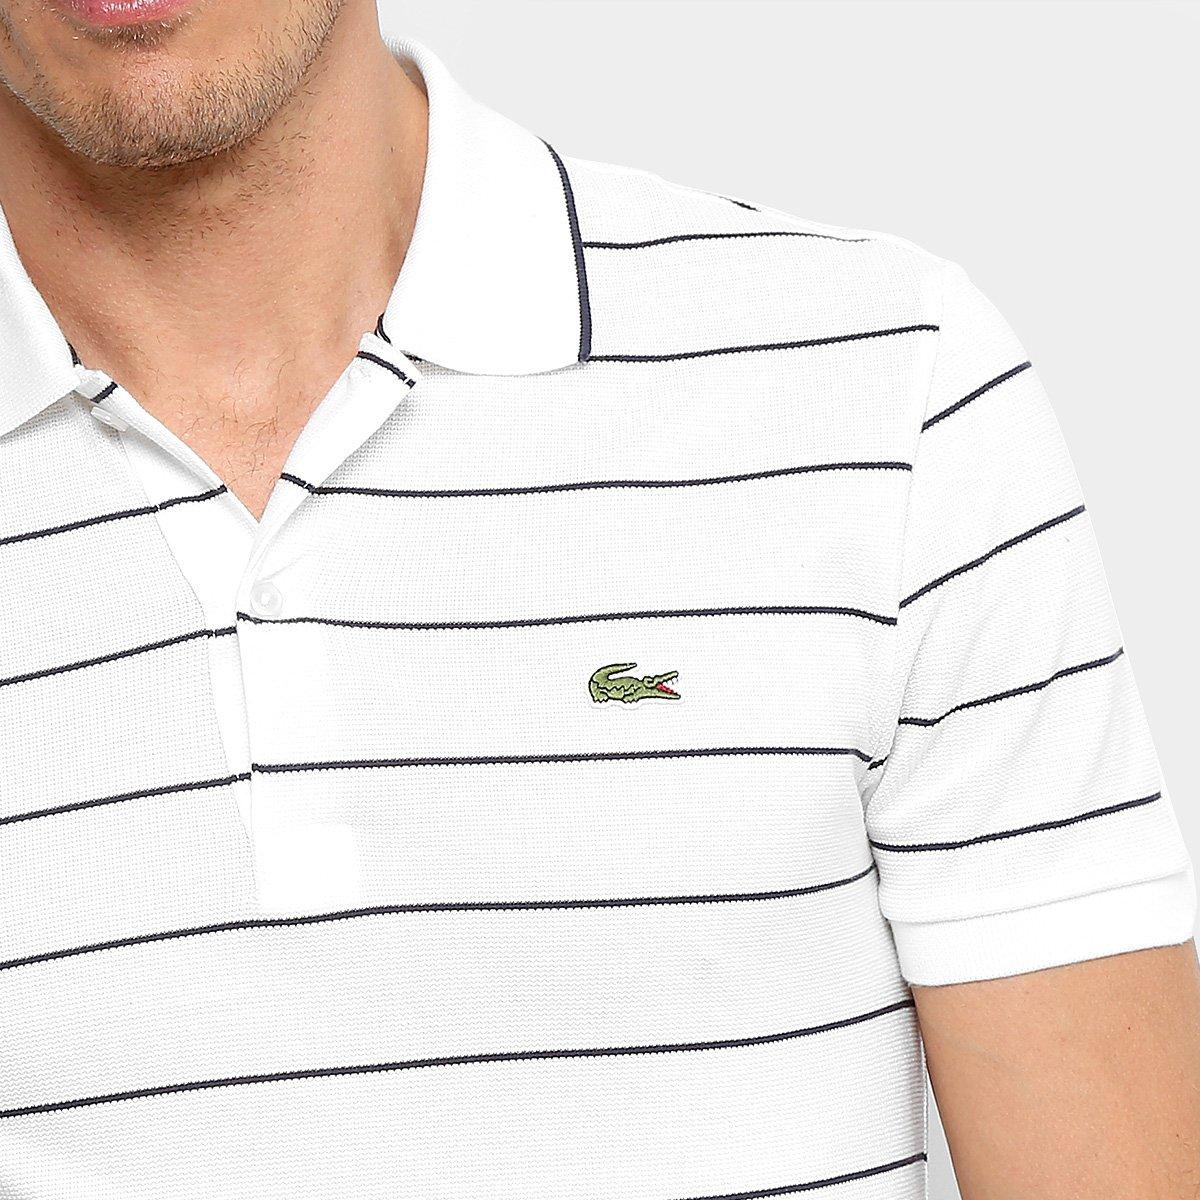 Camisa Polo Lacoste Listrada Slim Masculina Compre Agora Netshoes